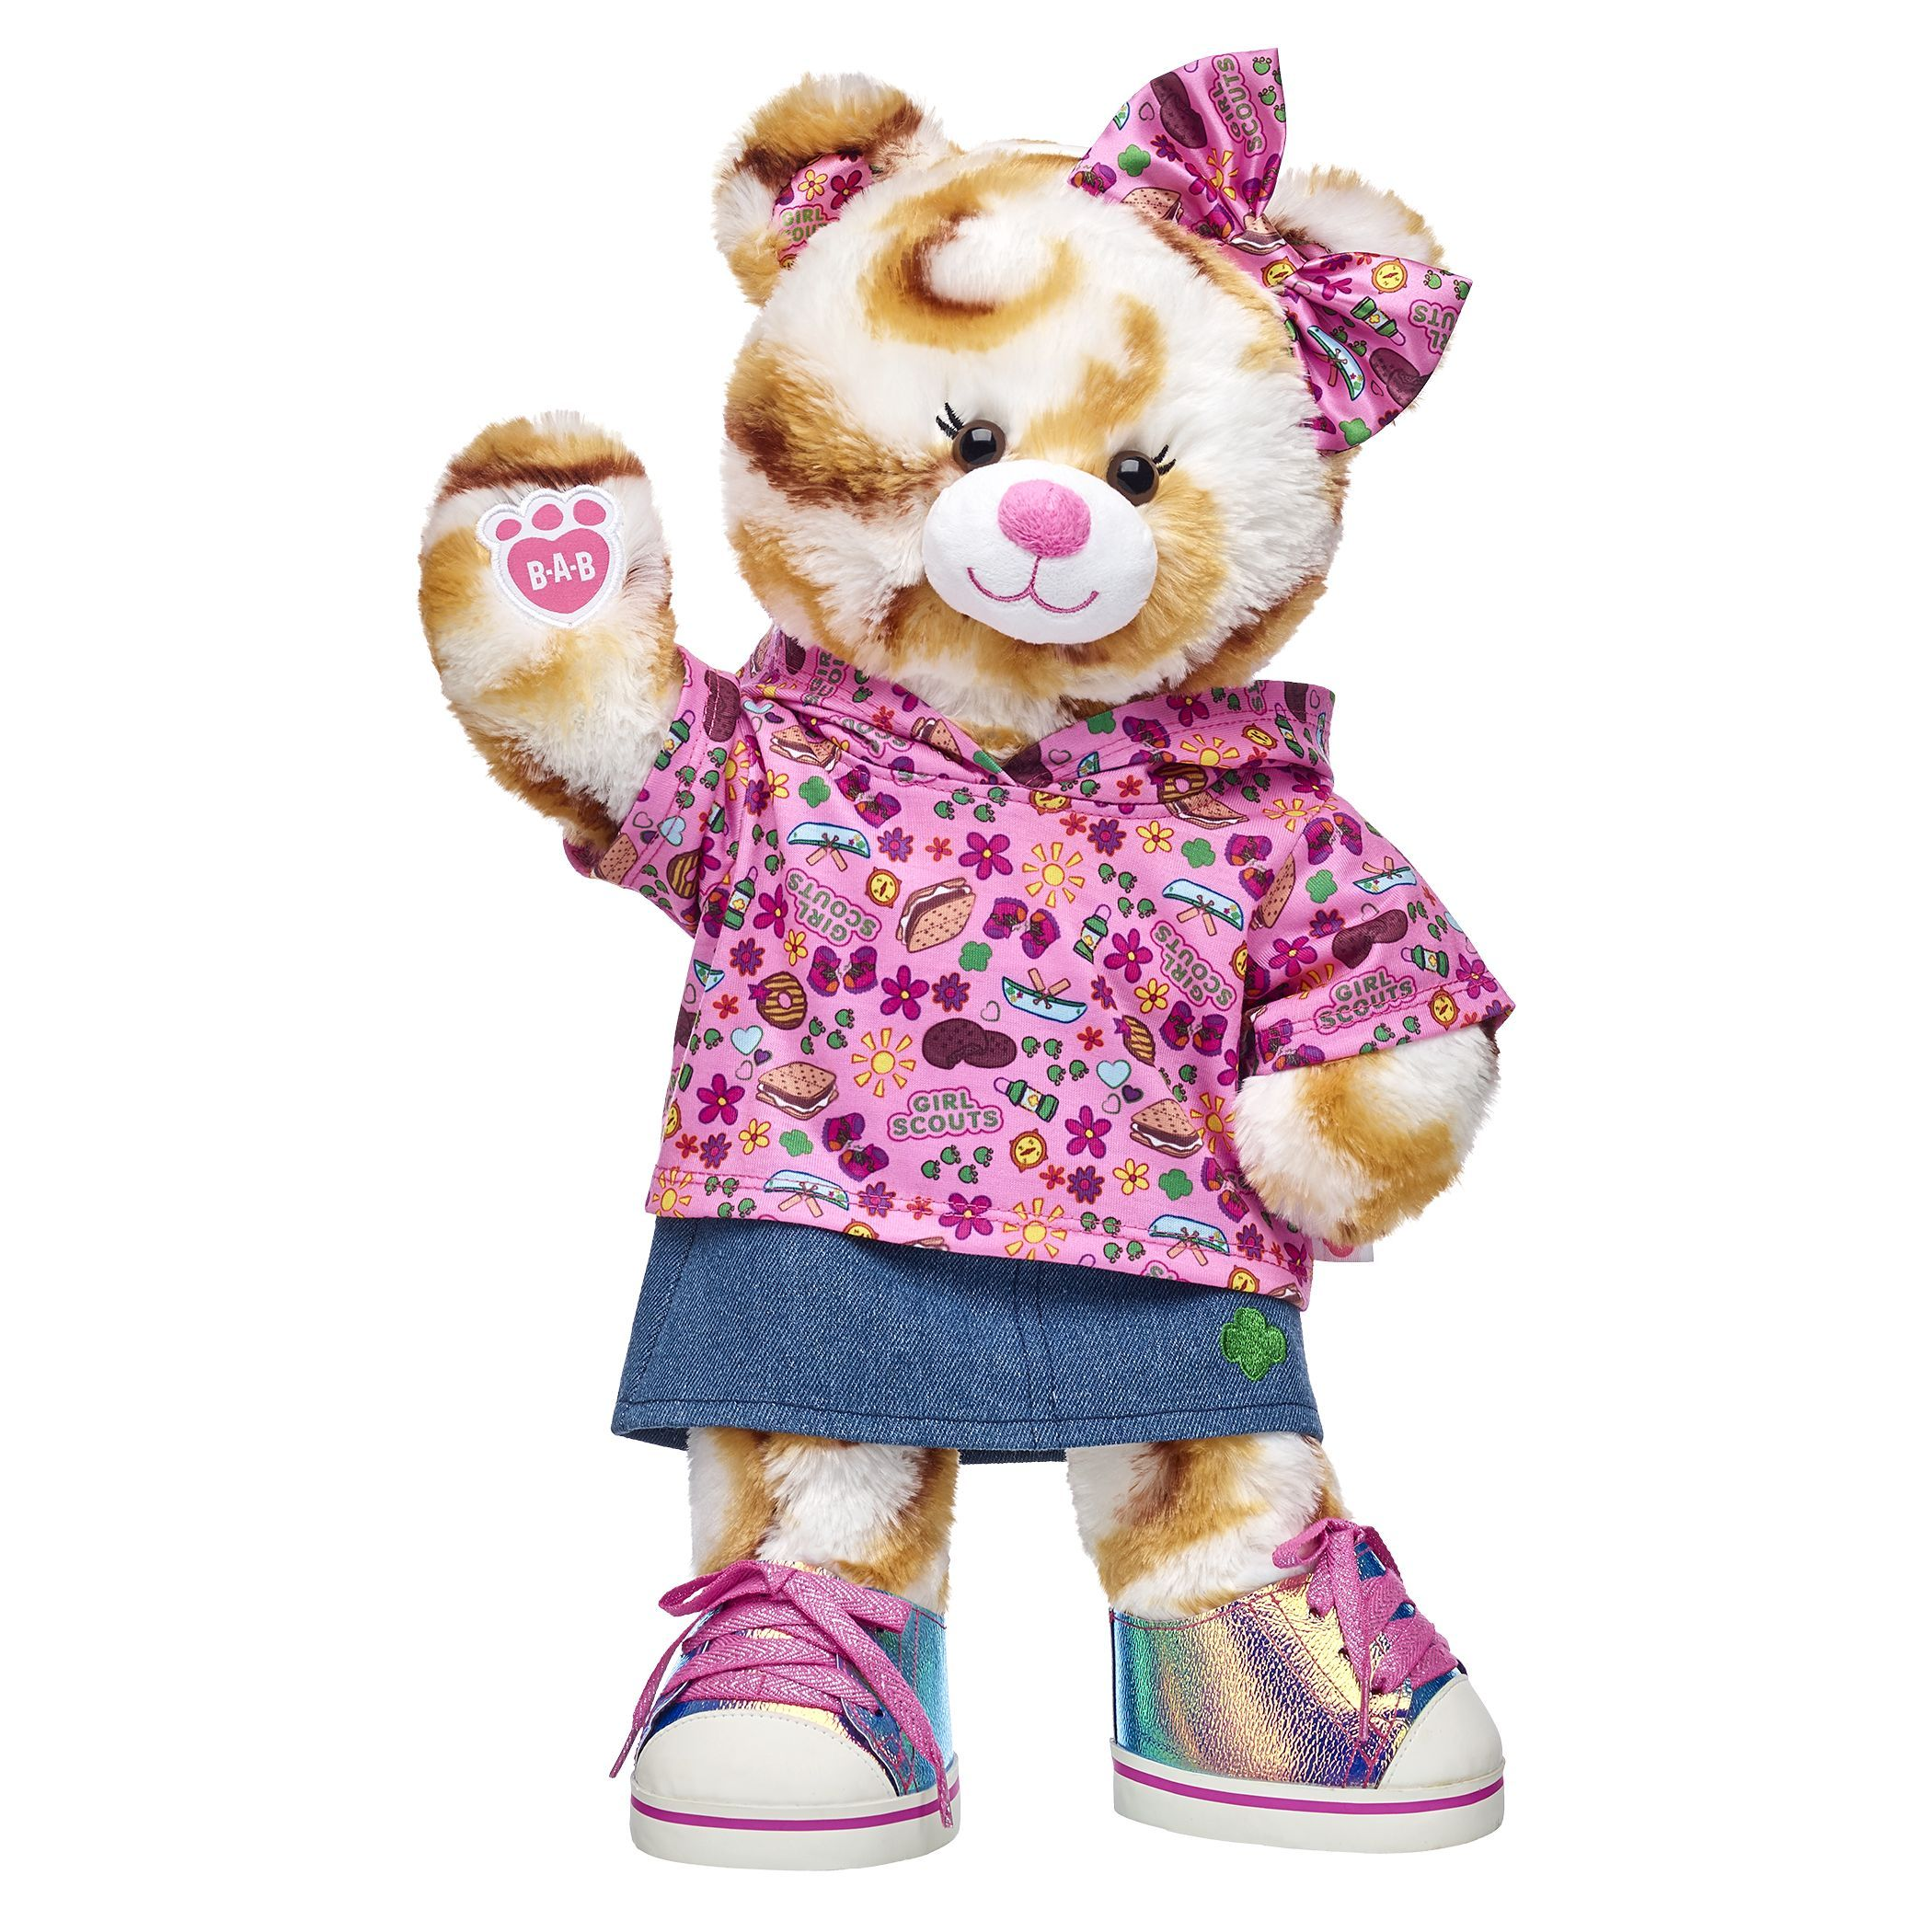 Dolls & Bears Build A Bear Workshop Fancy Fashion Doll Outfit Stuffed Toy  Dress Bow Accessory Bears gamersjo.com